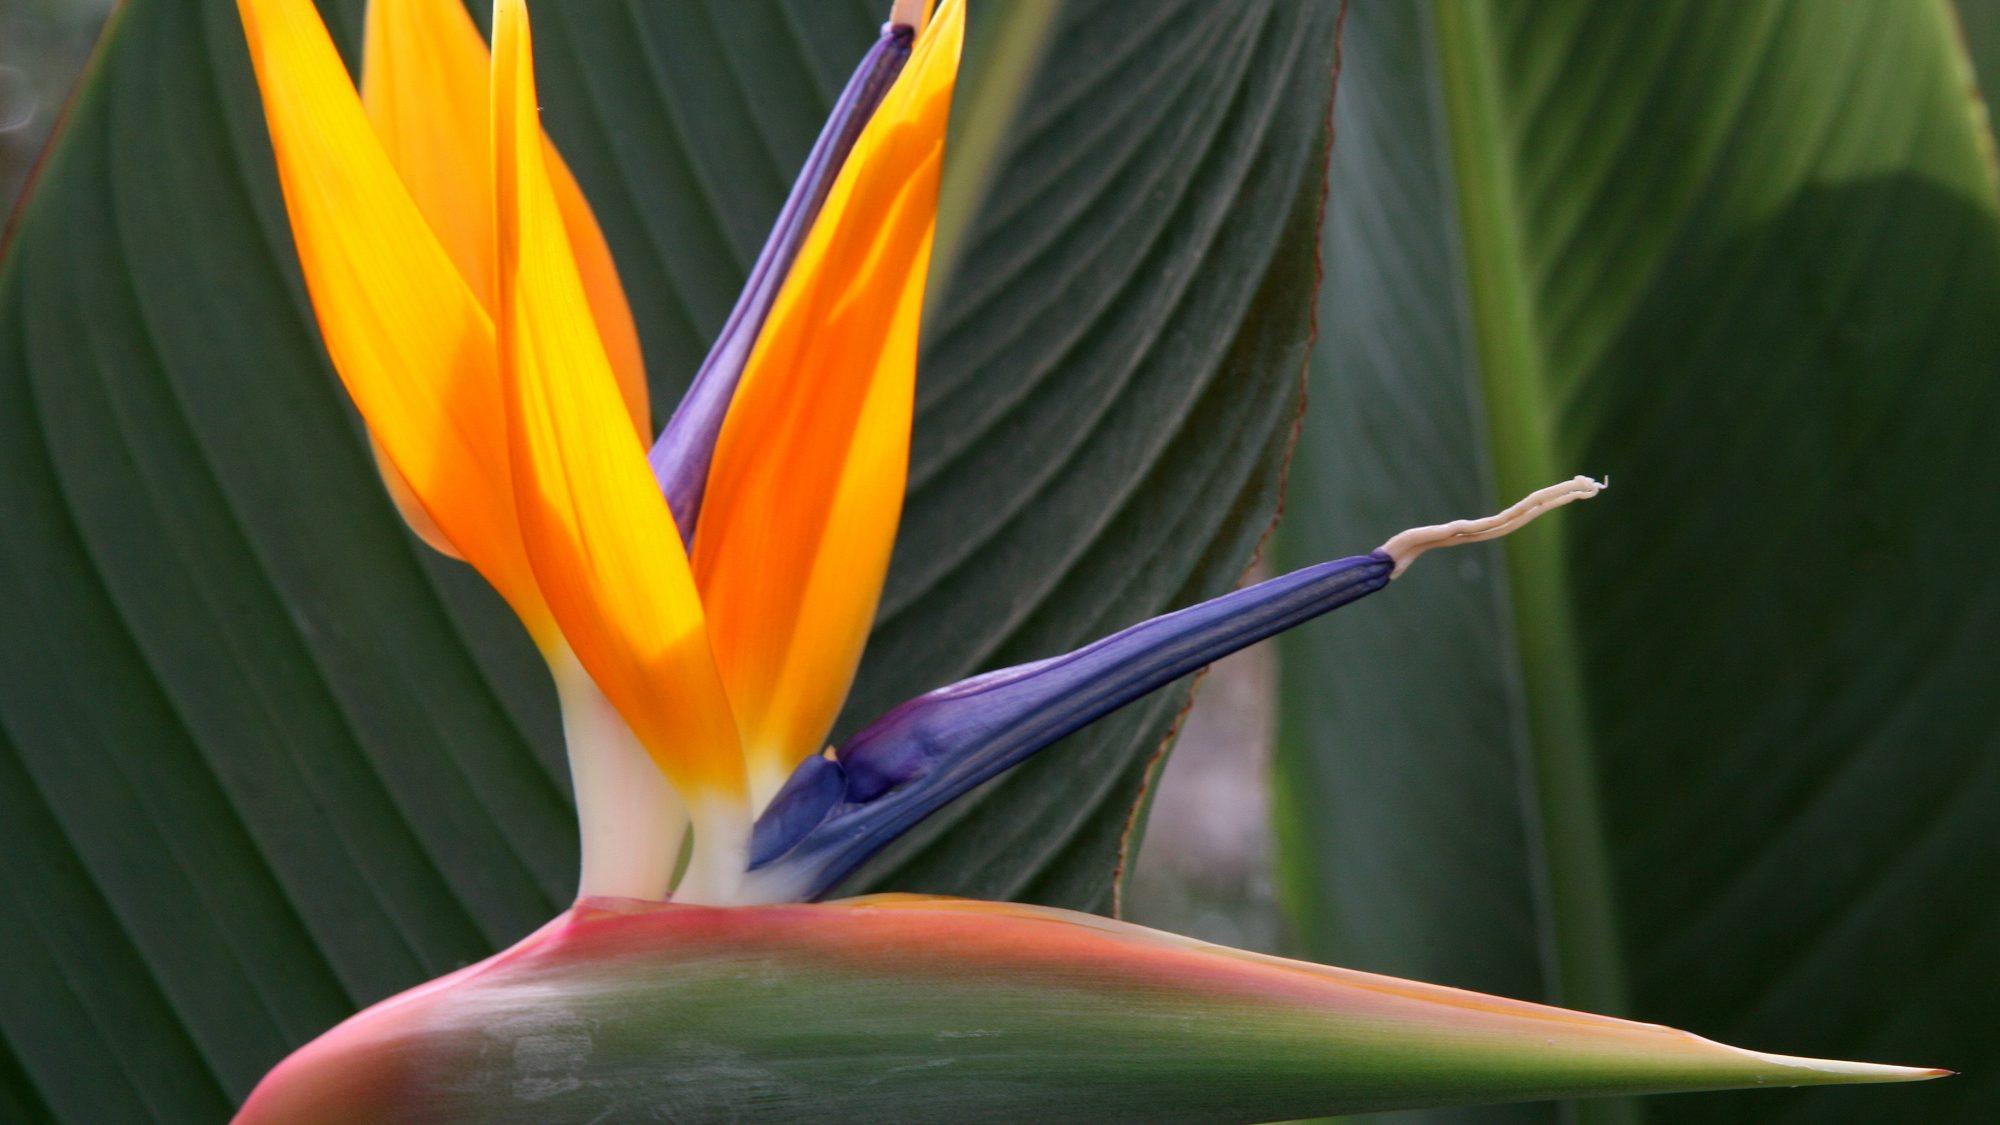 Strelitzia also known as Bird of Paradise.